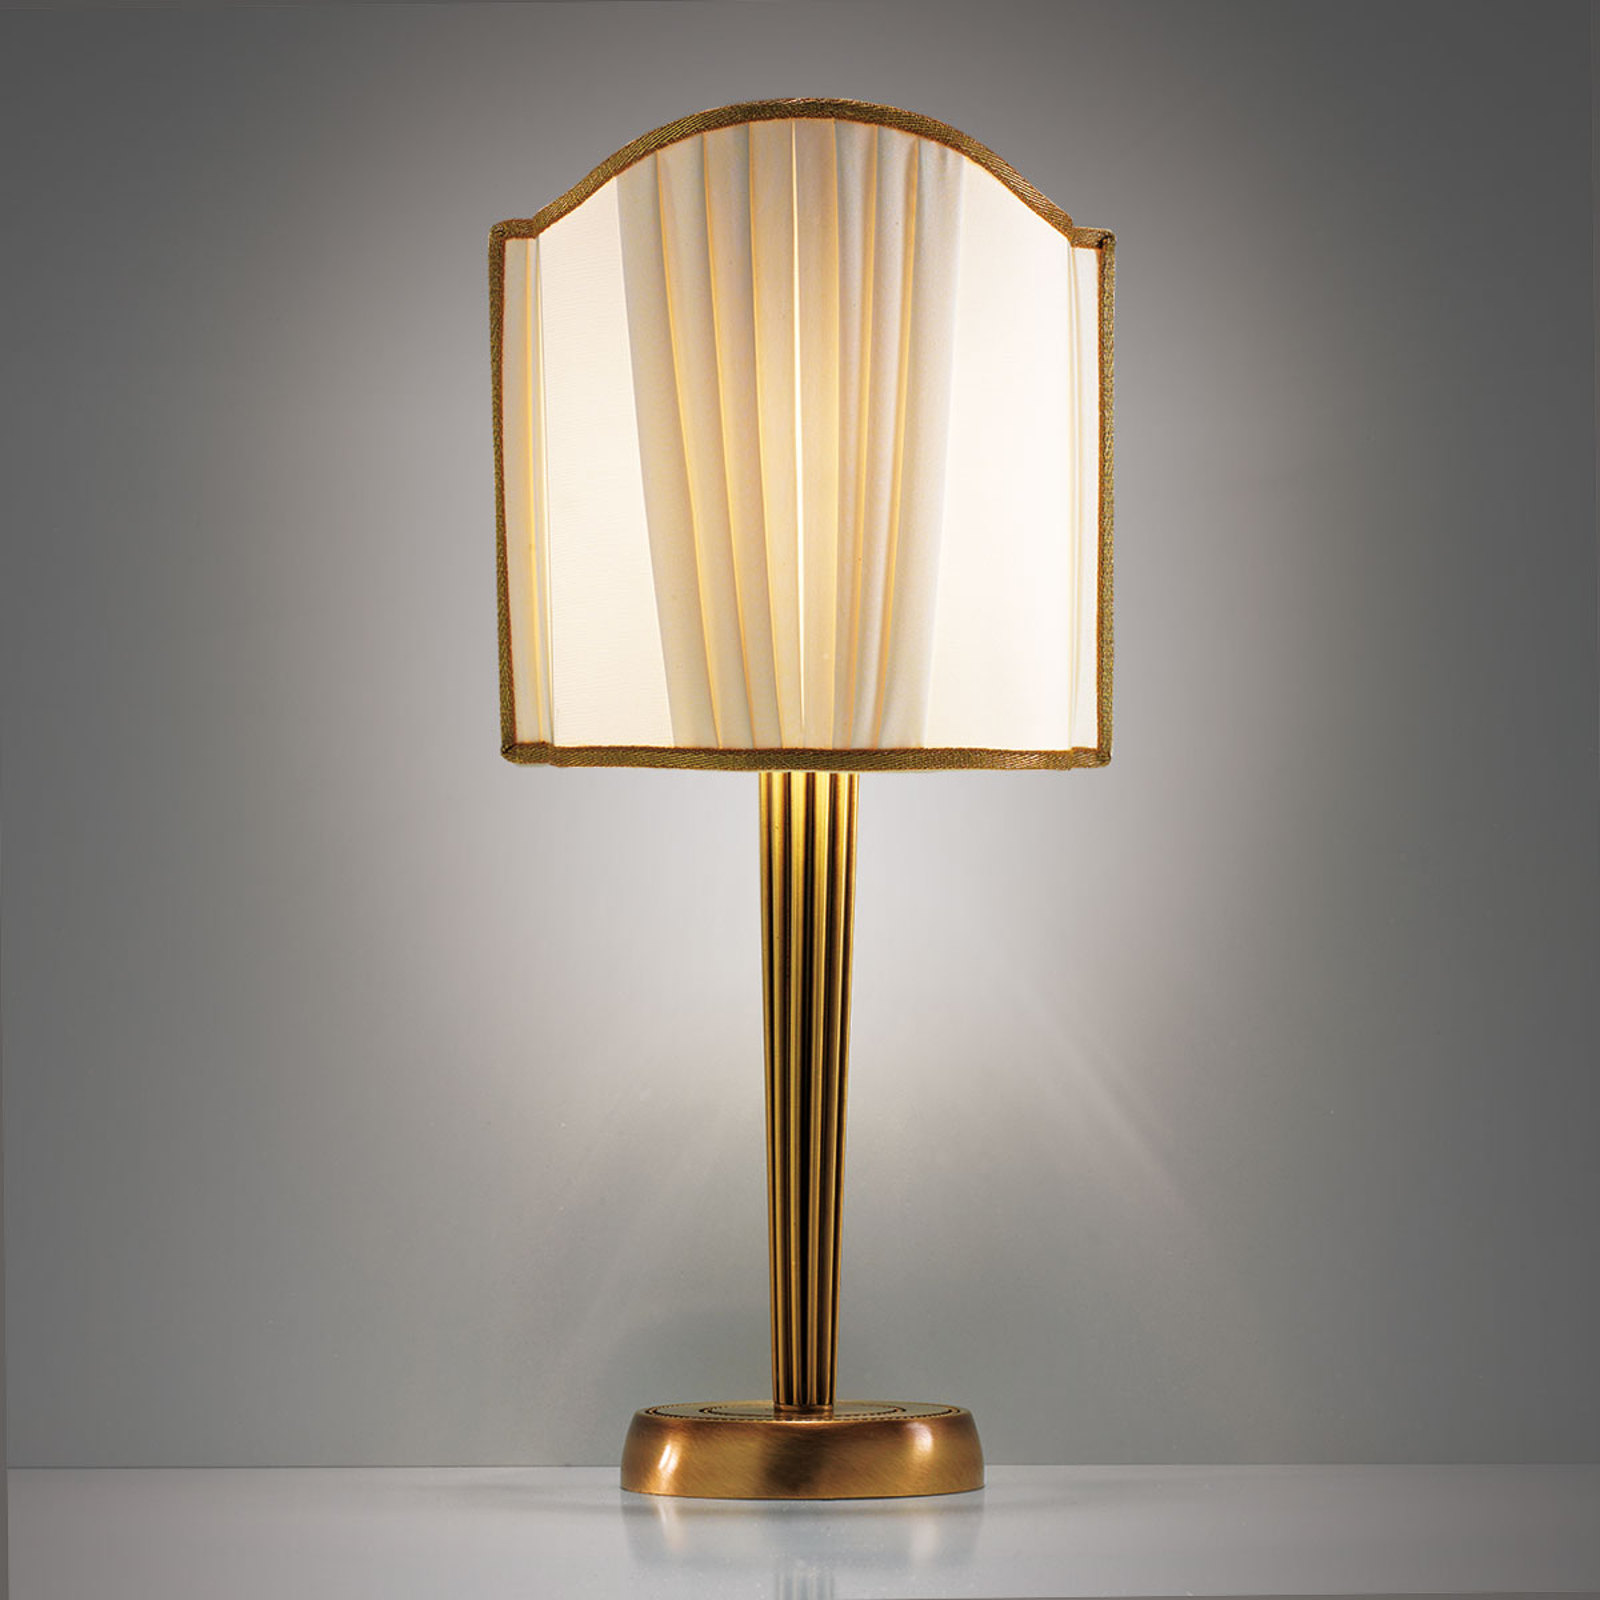 Lampada da tavolo Belle Epoque, alta 20 cm